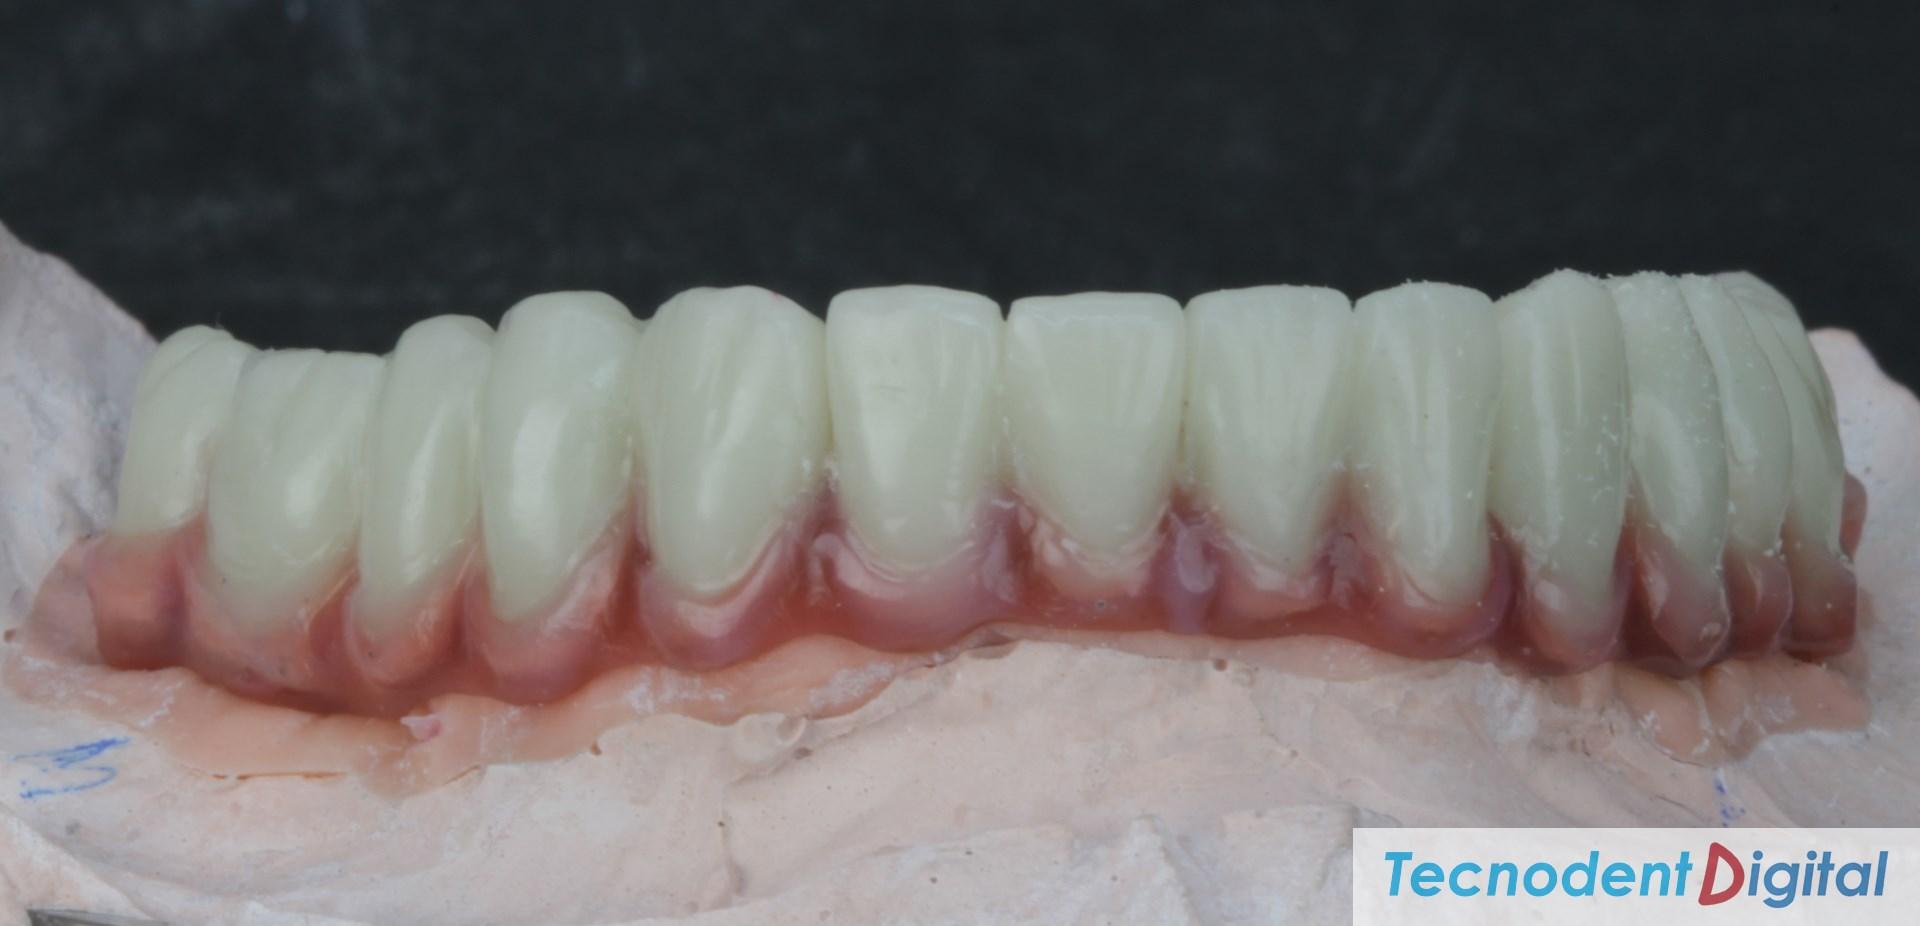 Rehabilitacion sobre implantes Exocad thimble para coronas y gingiva